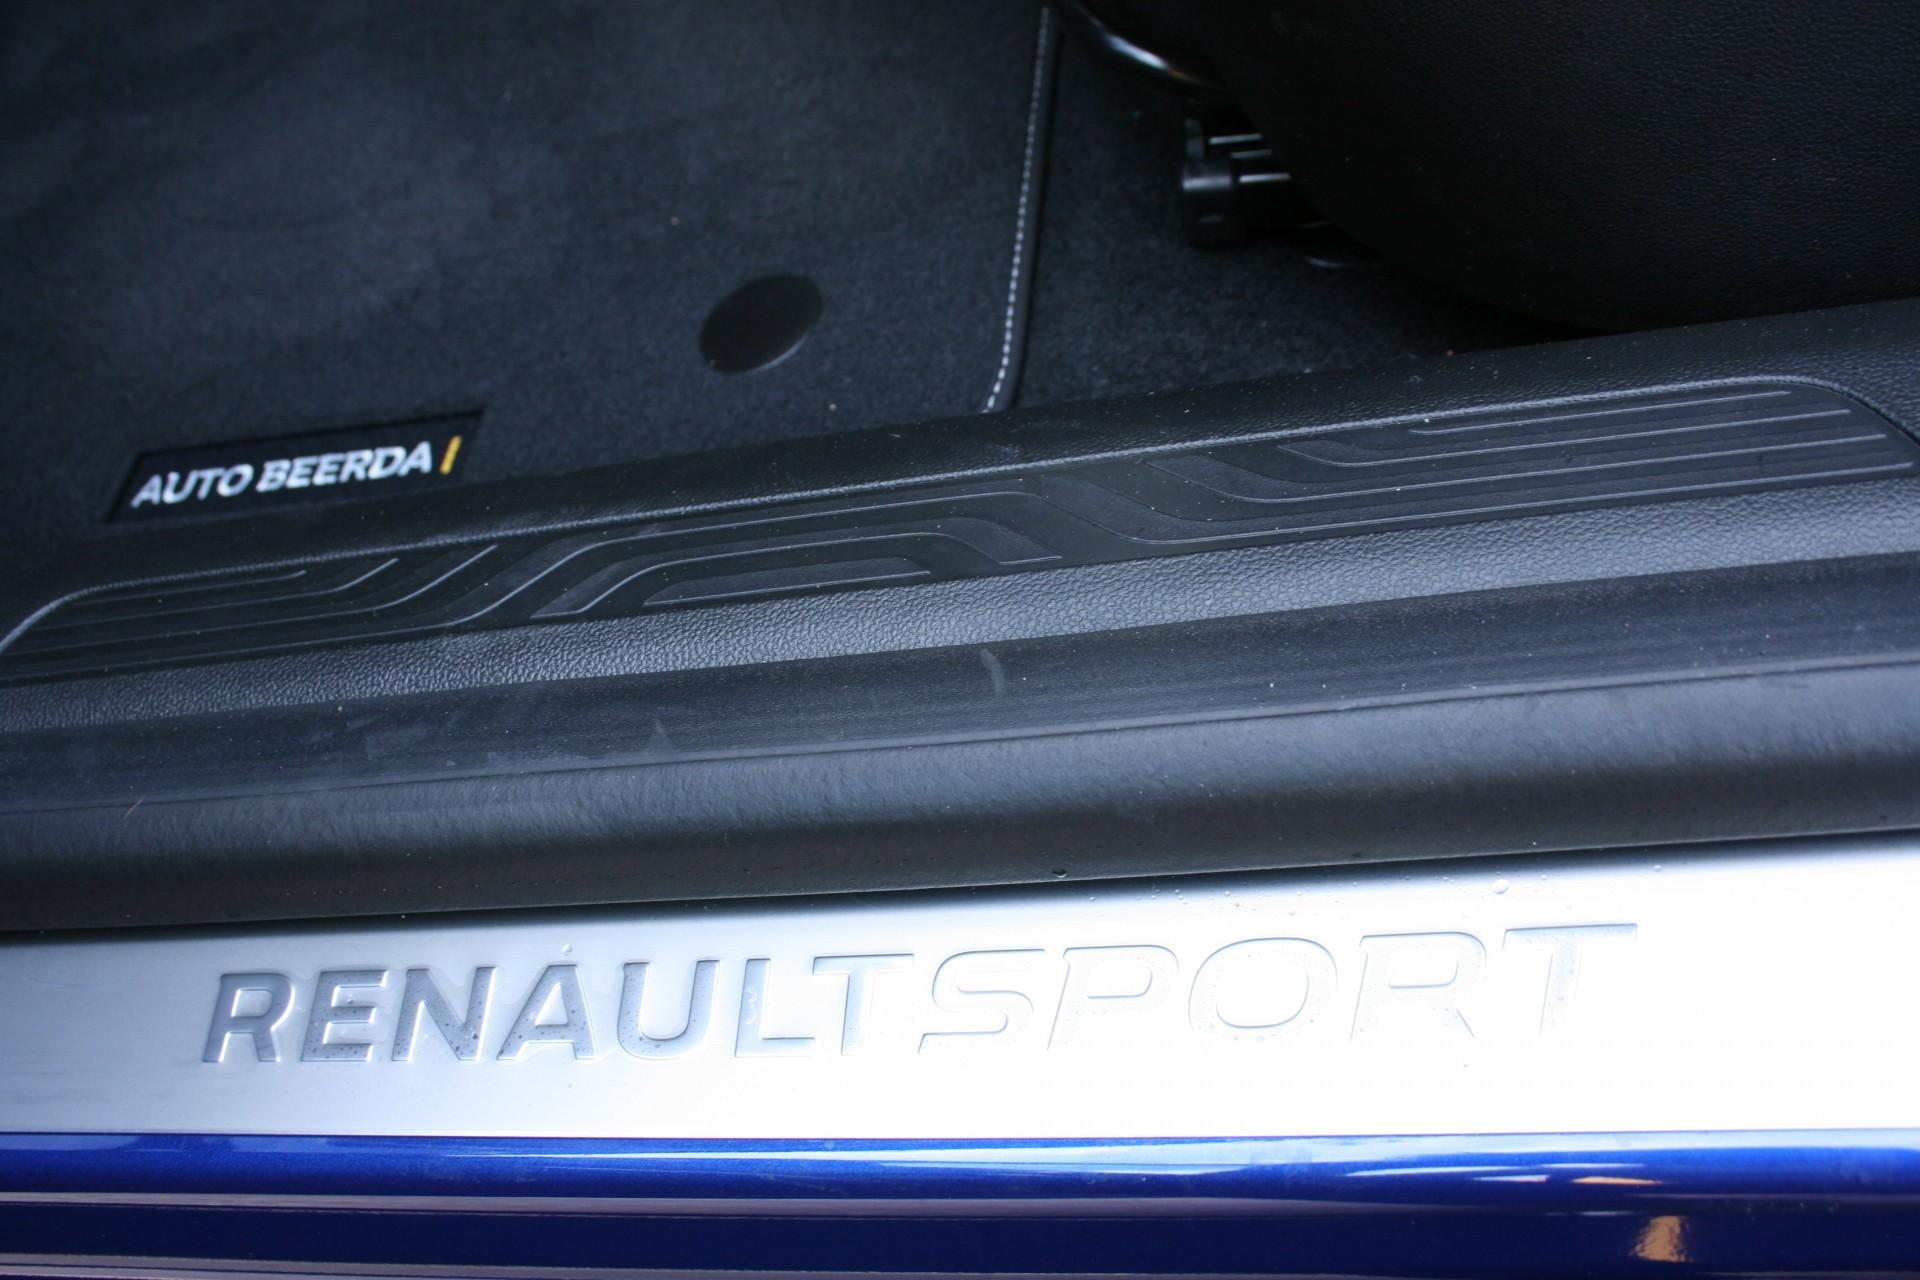 Renault Mégane foto 11